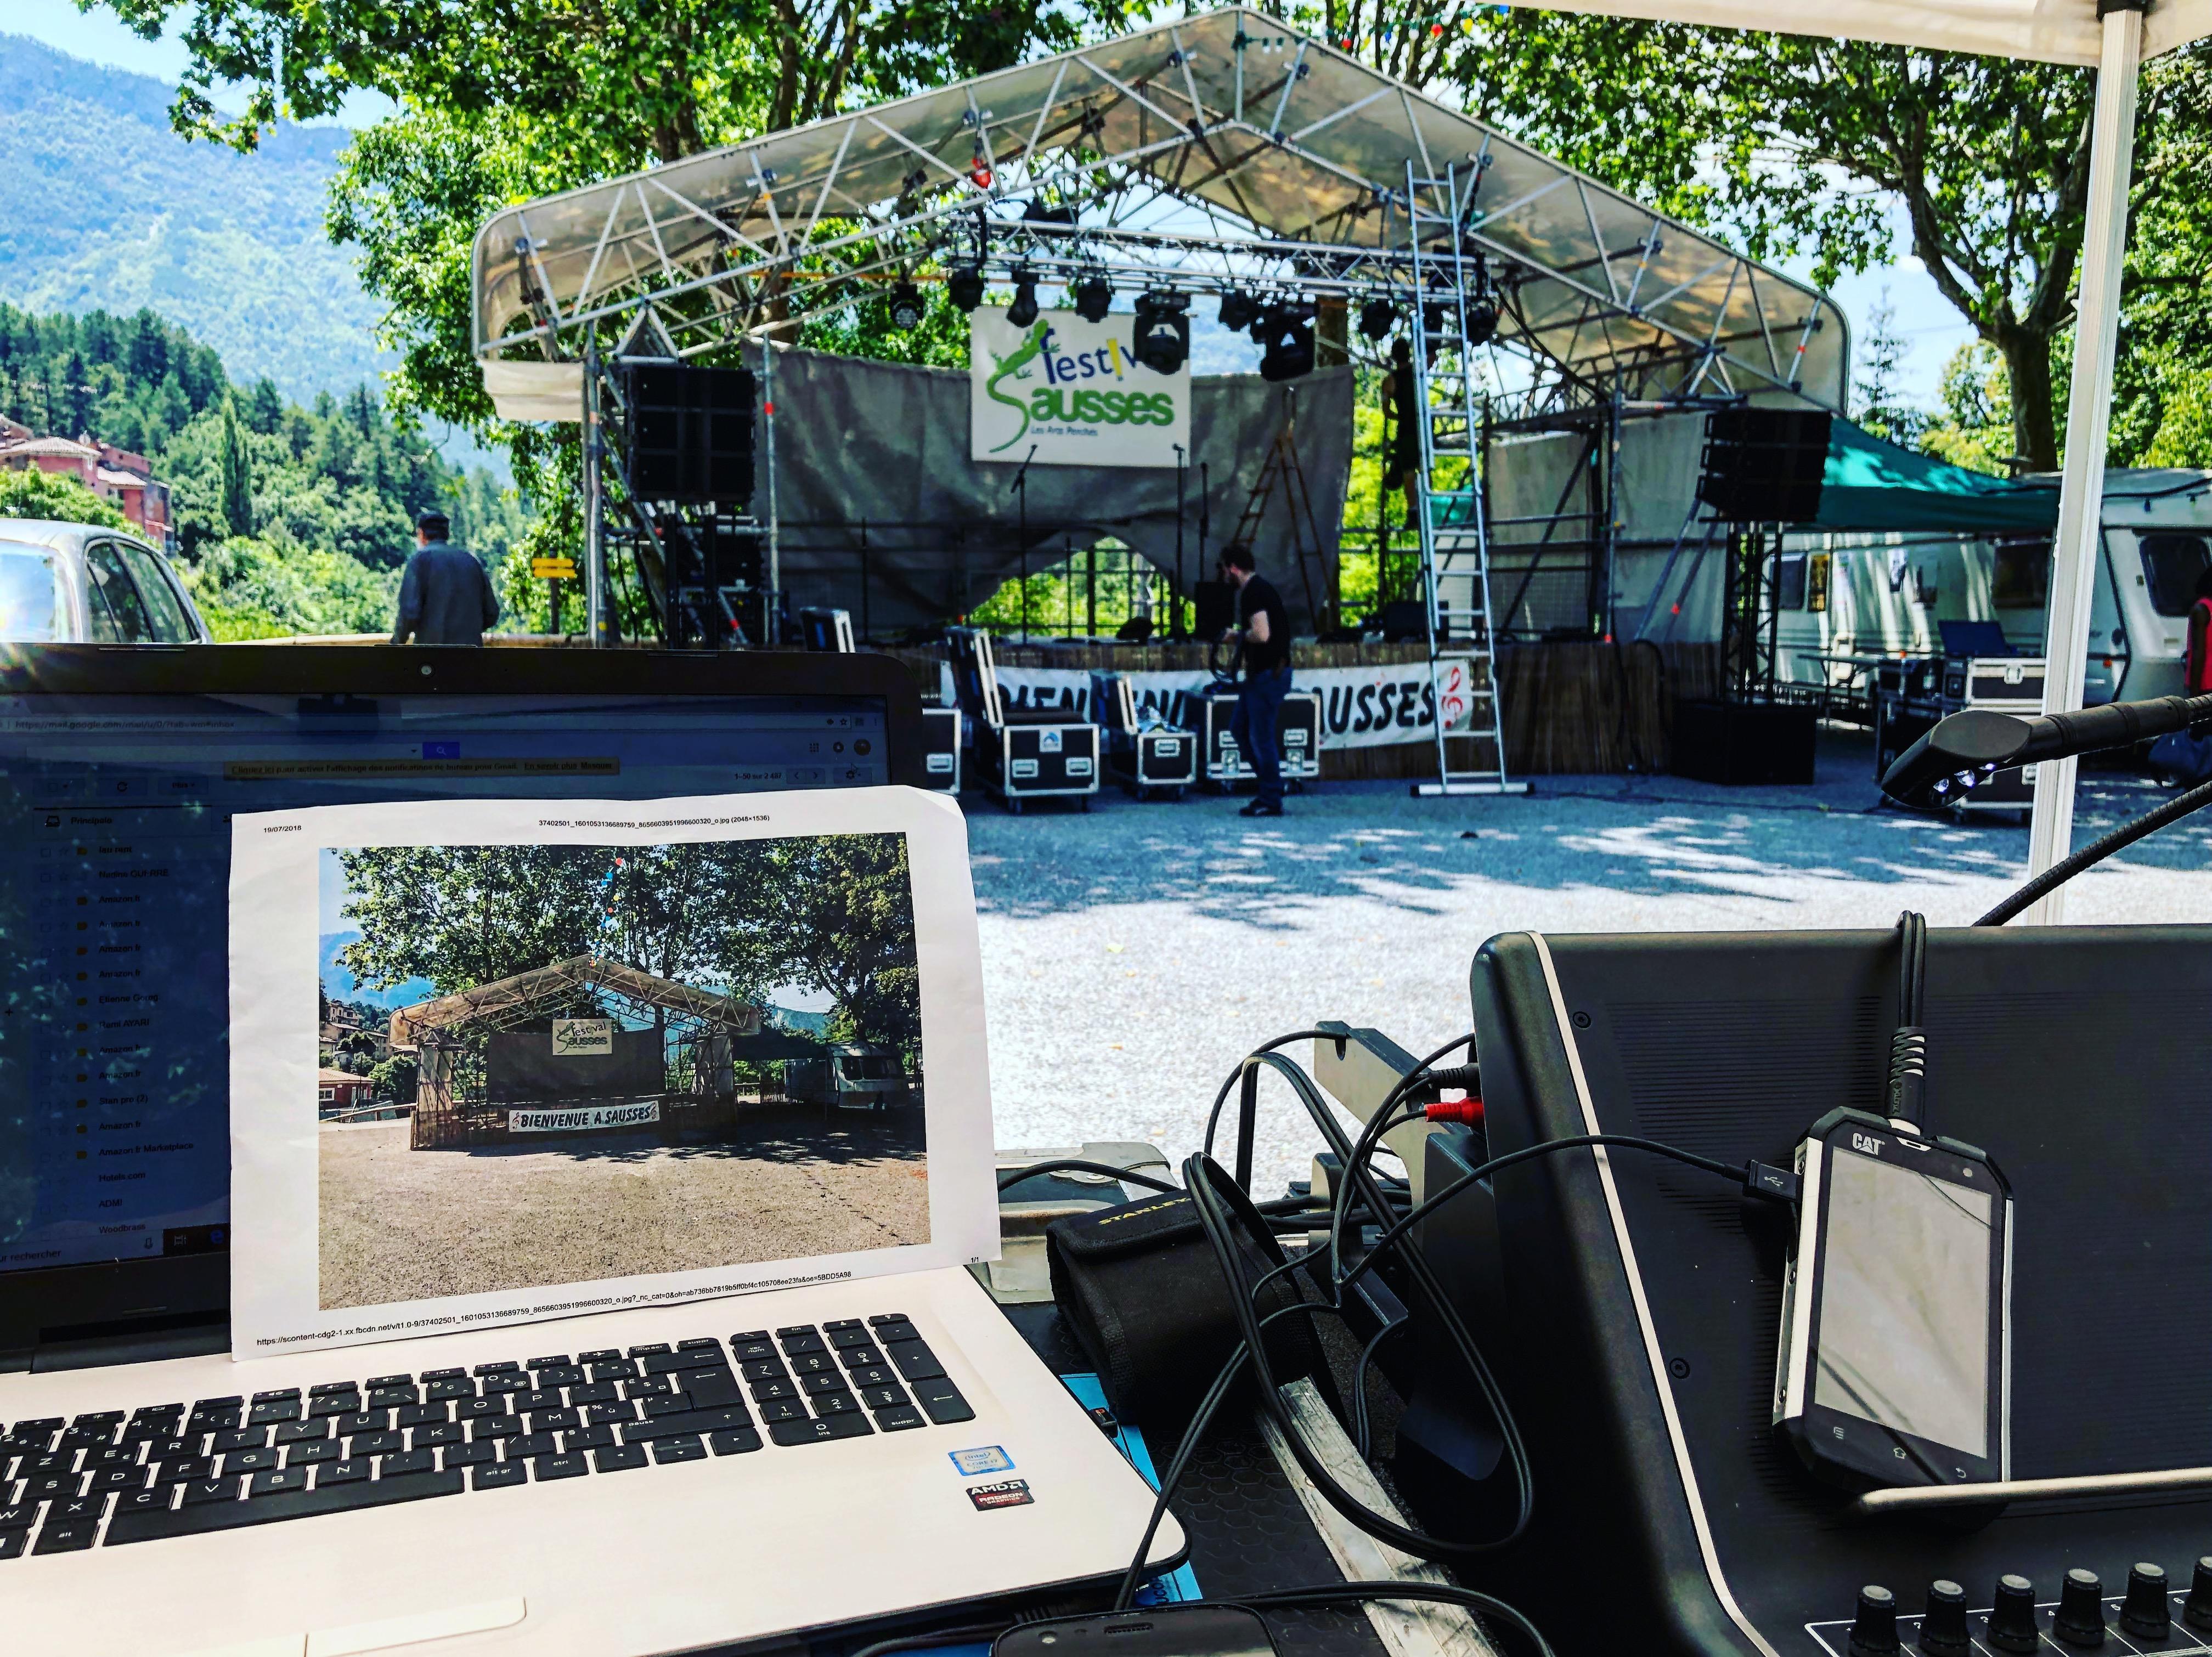 aucop-event-festival-festival en sausses-sonorisation-eclairage-cali-kolinka-dahan-scene-audiovisuel-evenementiel-alpes de haute provence-carros-nice-console-yamaha-oxo-projecteurs-montage